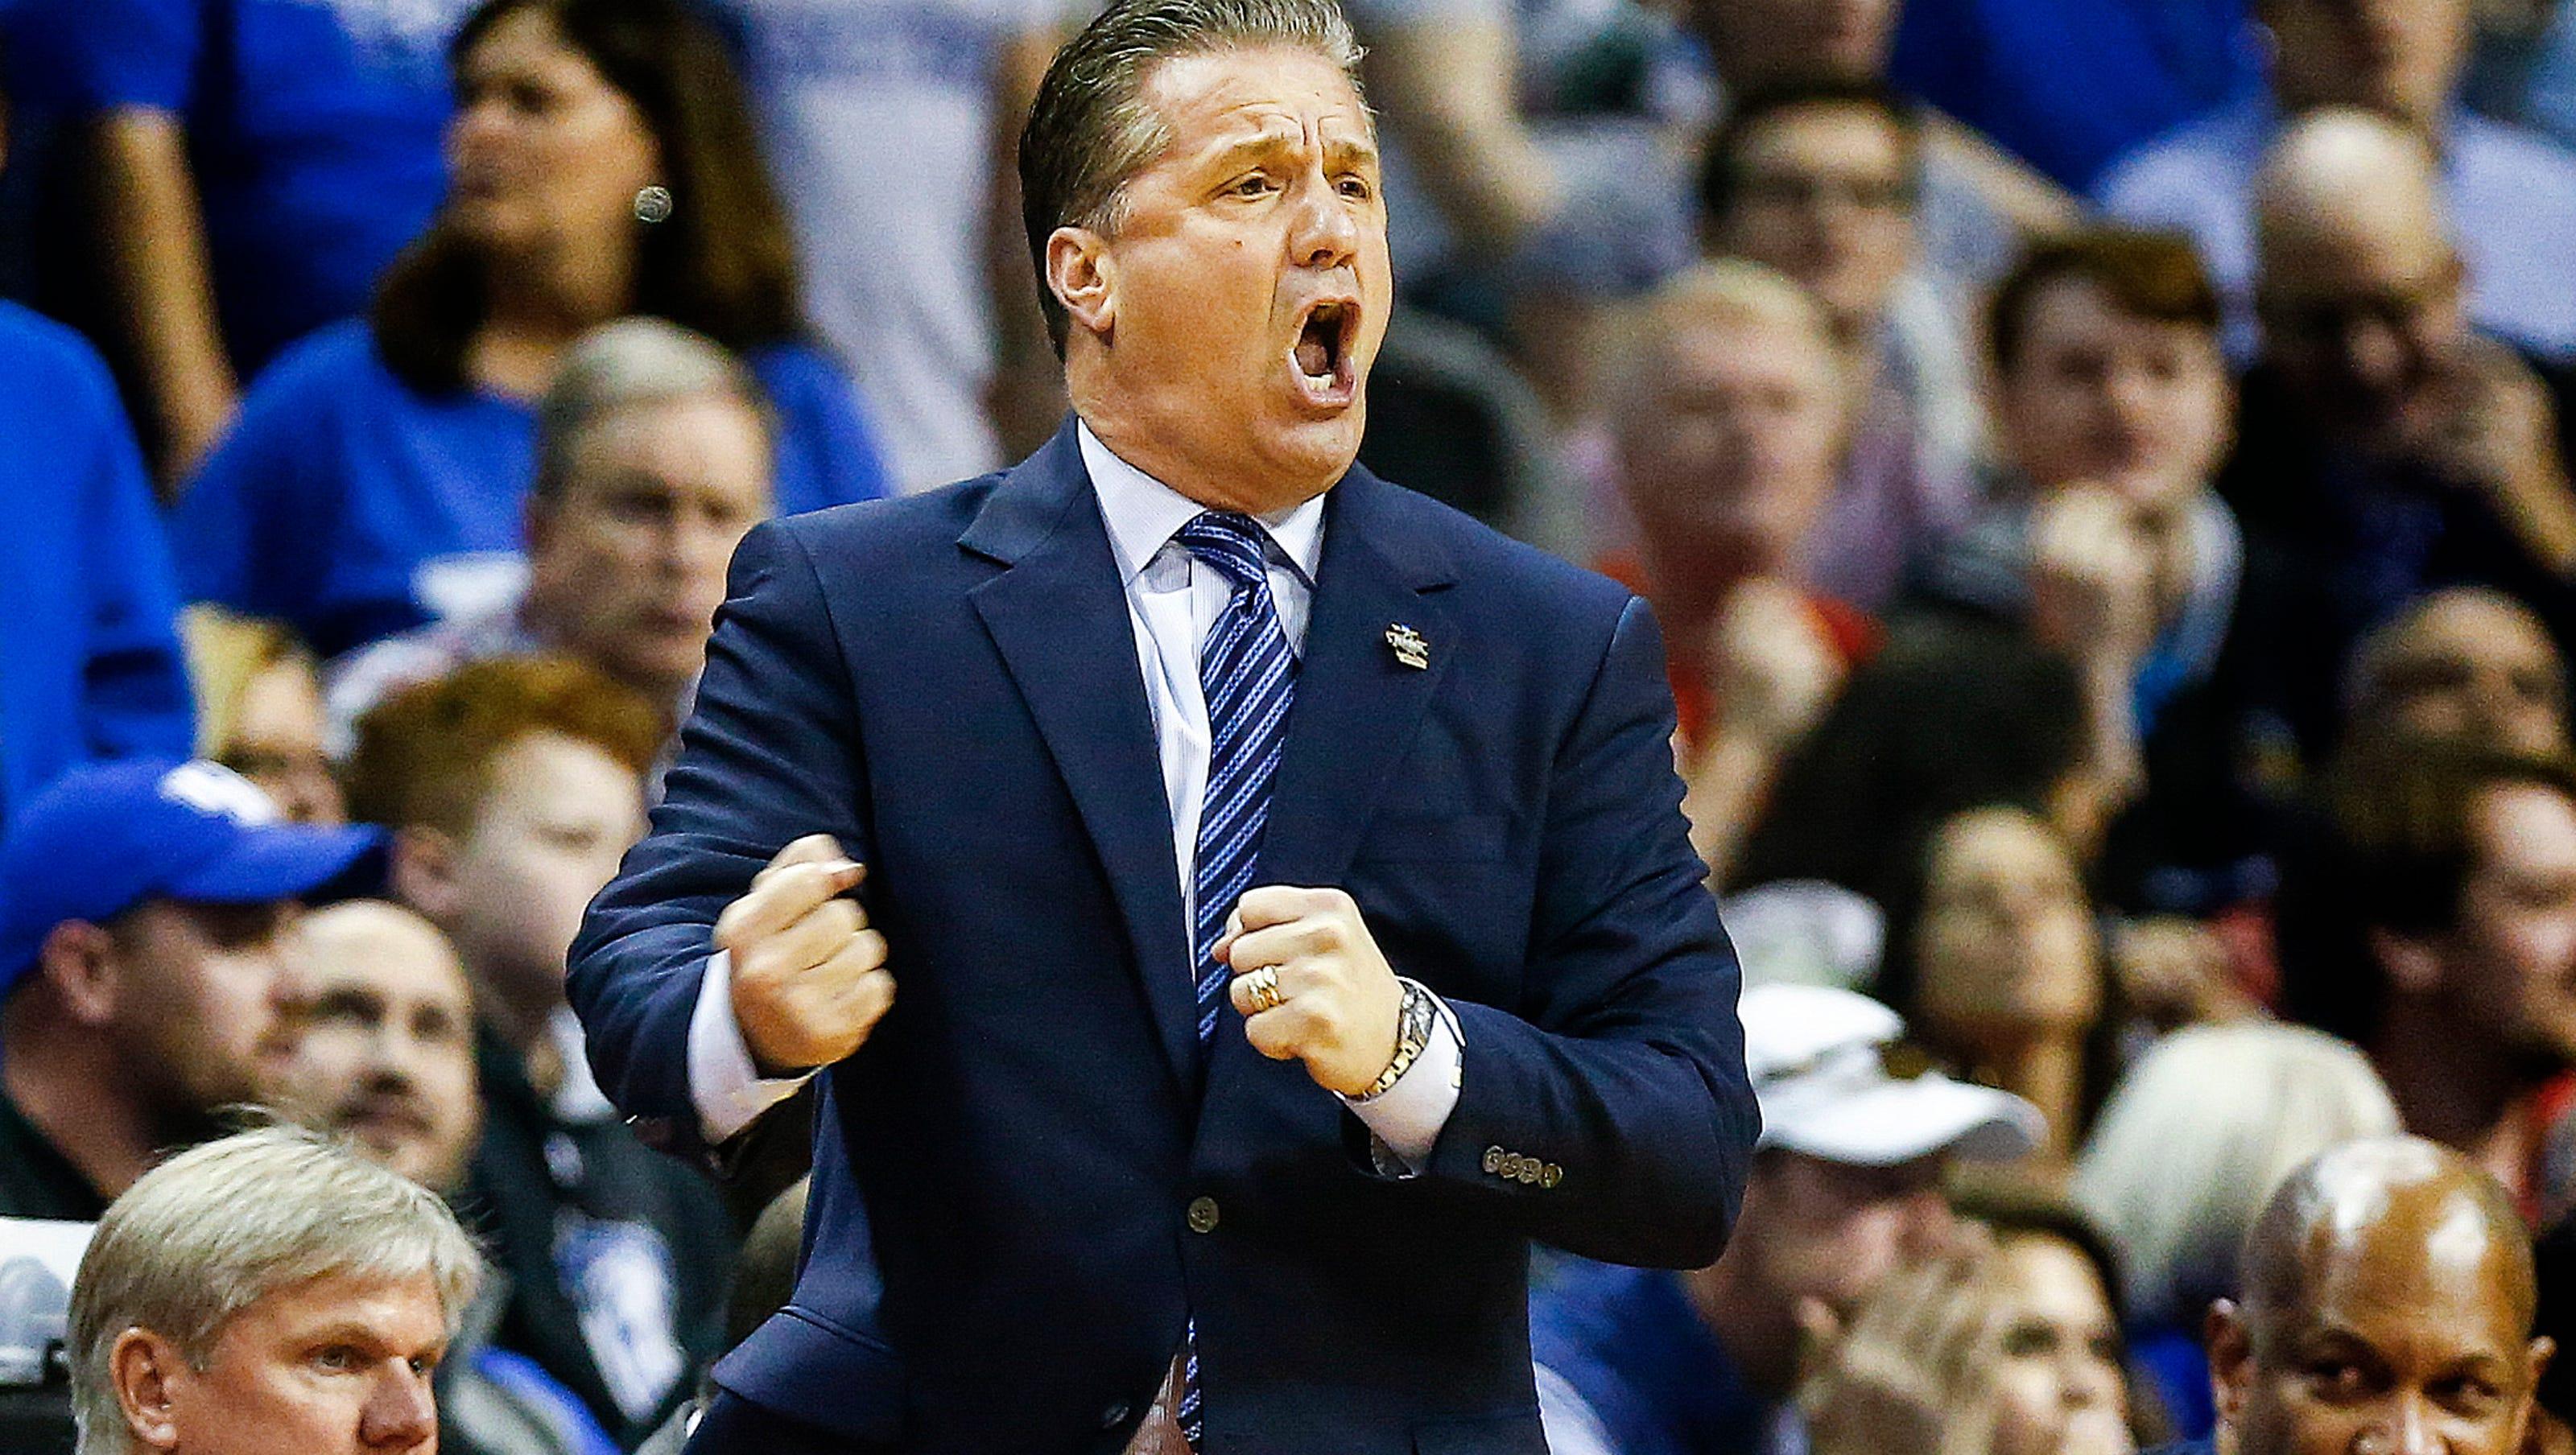 2013 Recruits Uk Basketball And Football Recruiting News: Kentucky Basketball Recruiting: John Calipari Memphis